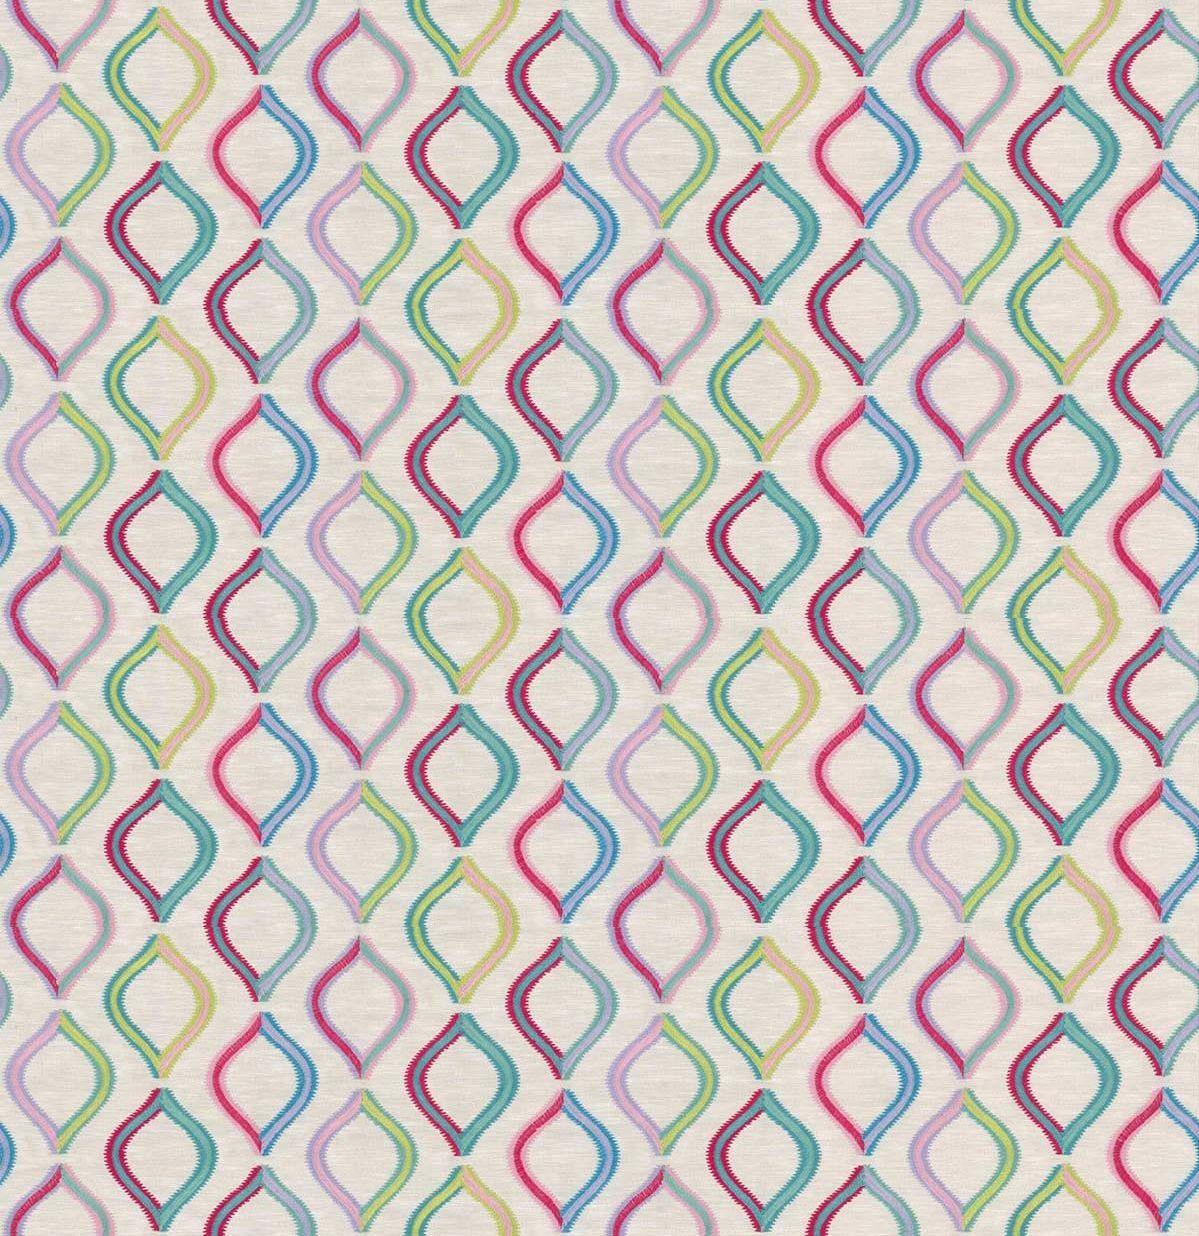 Spinning Top Fabric - Rainbow - by Prestigious